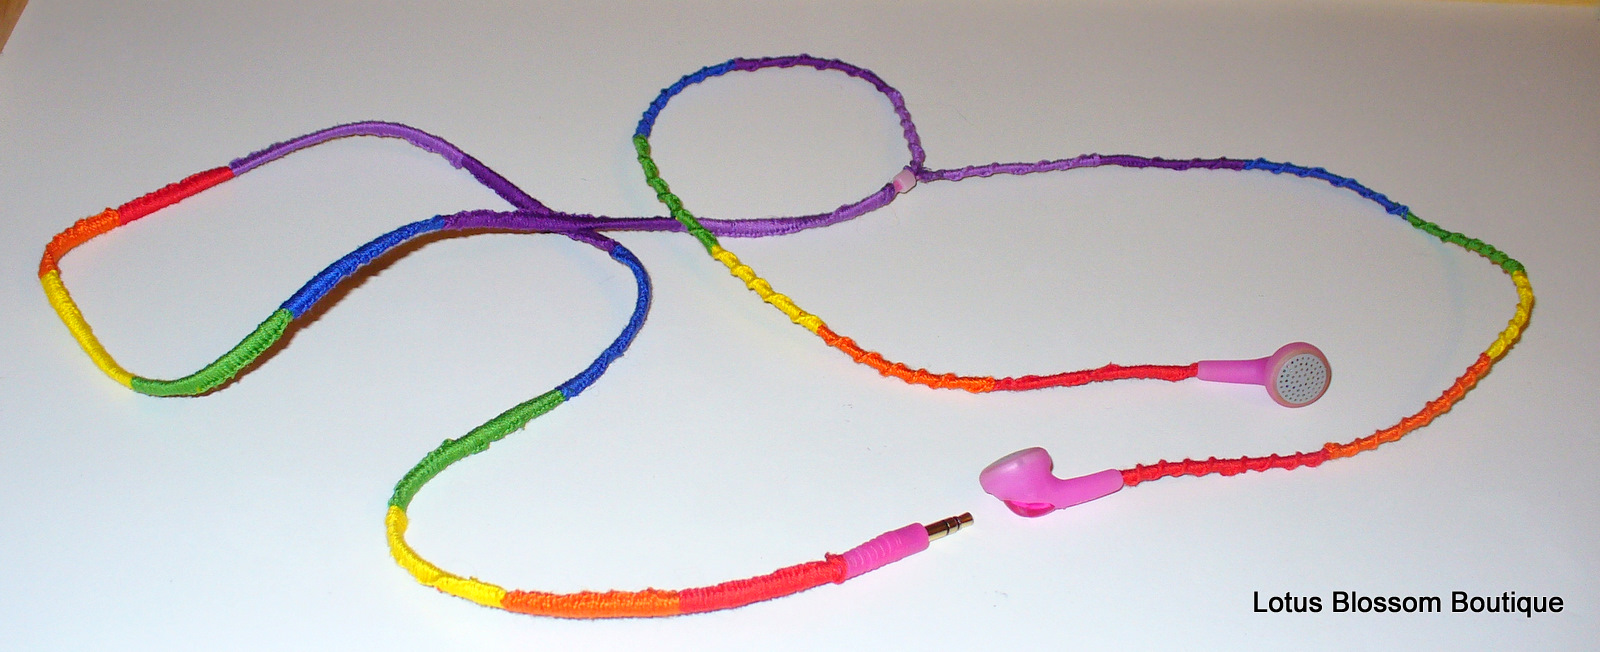 Embroidery floss headphones makaroka